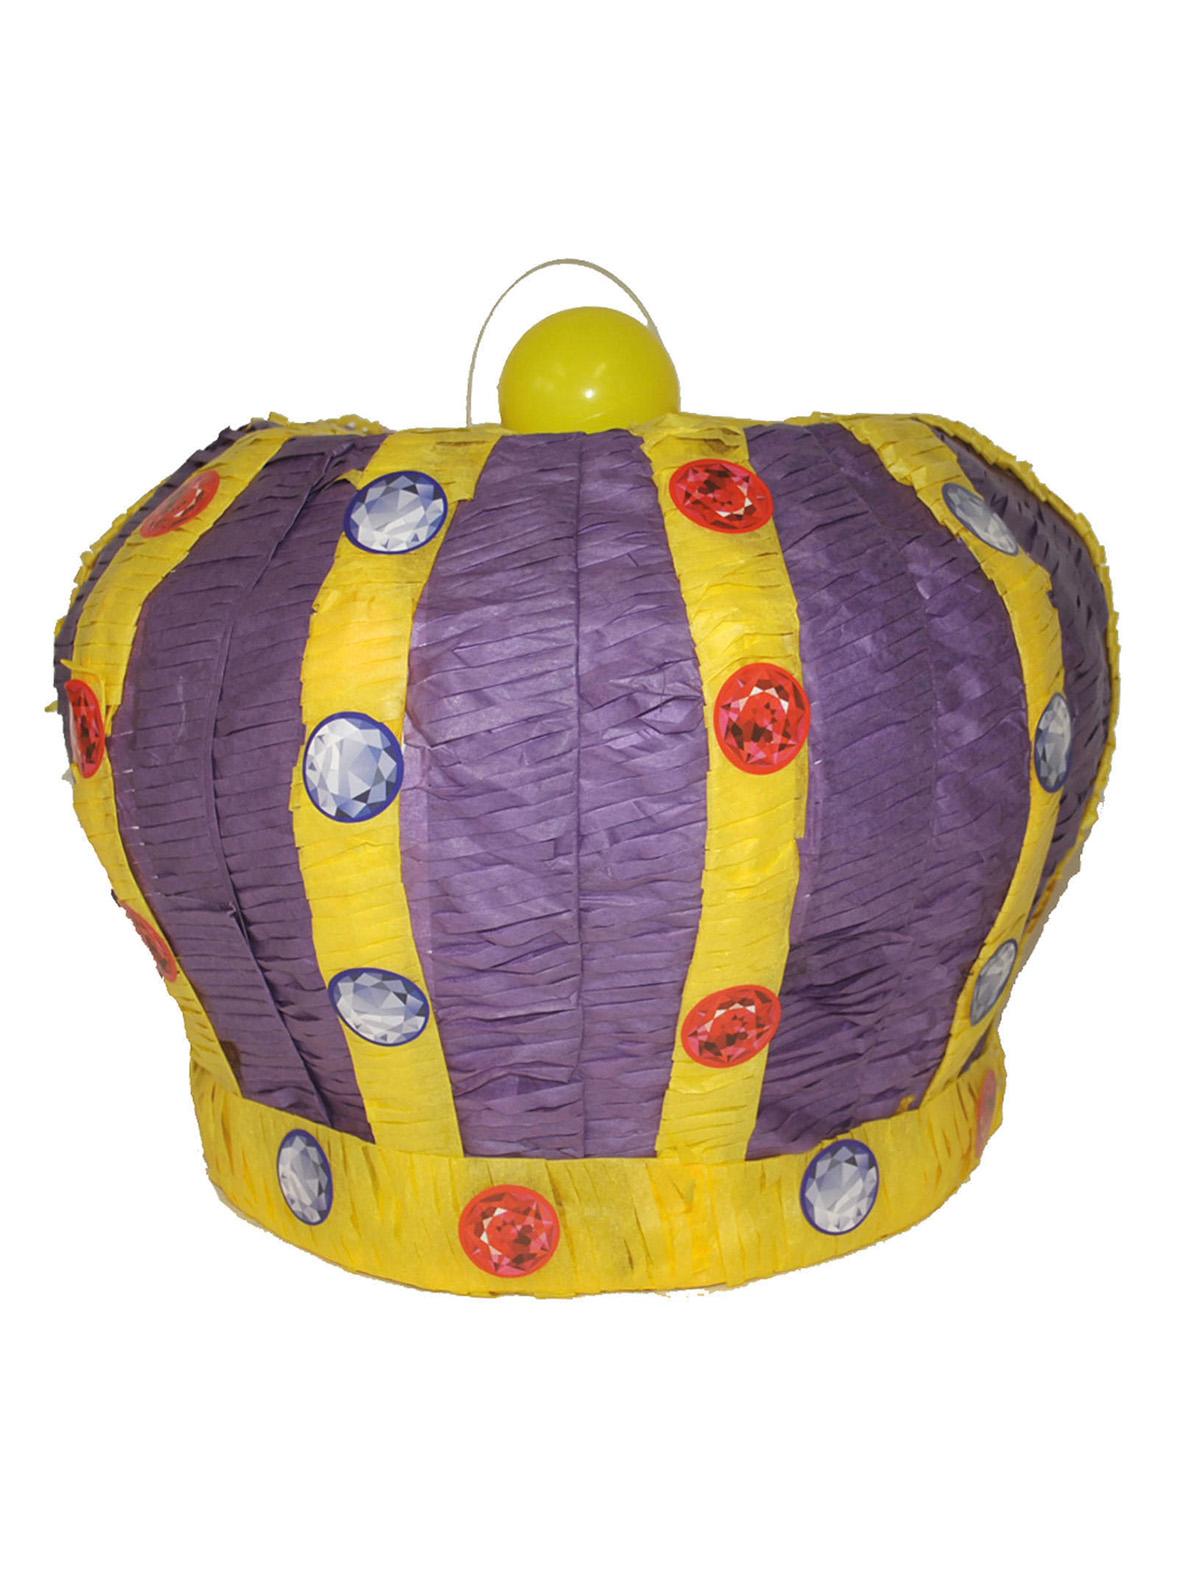 Pinata Krone Prinz